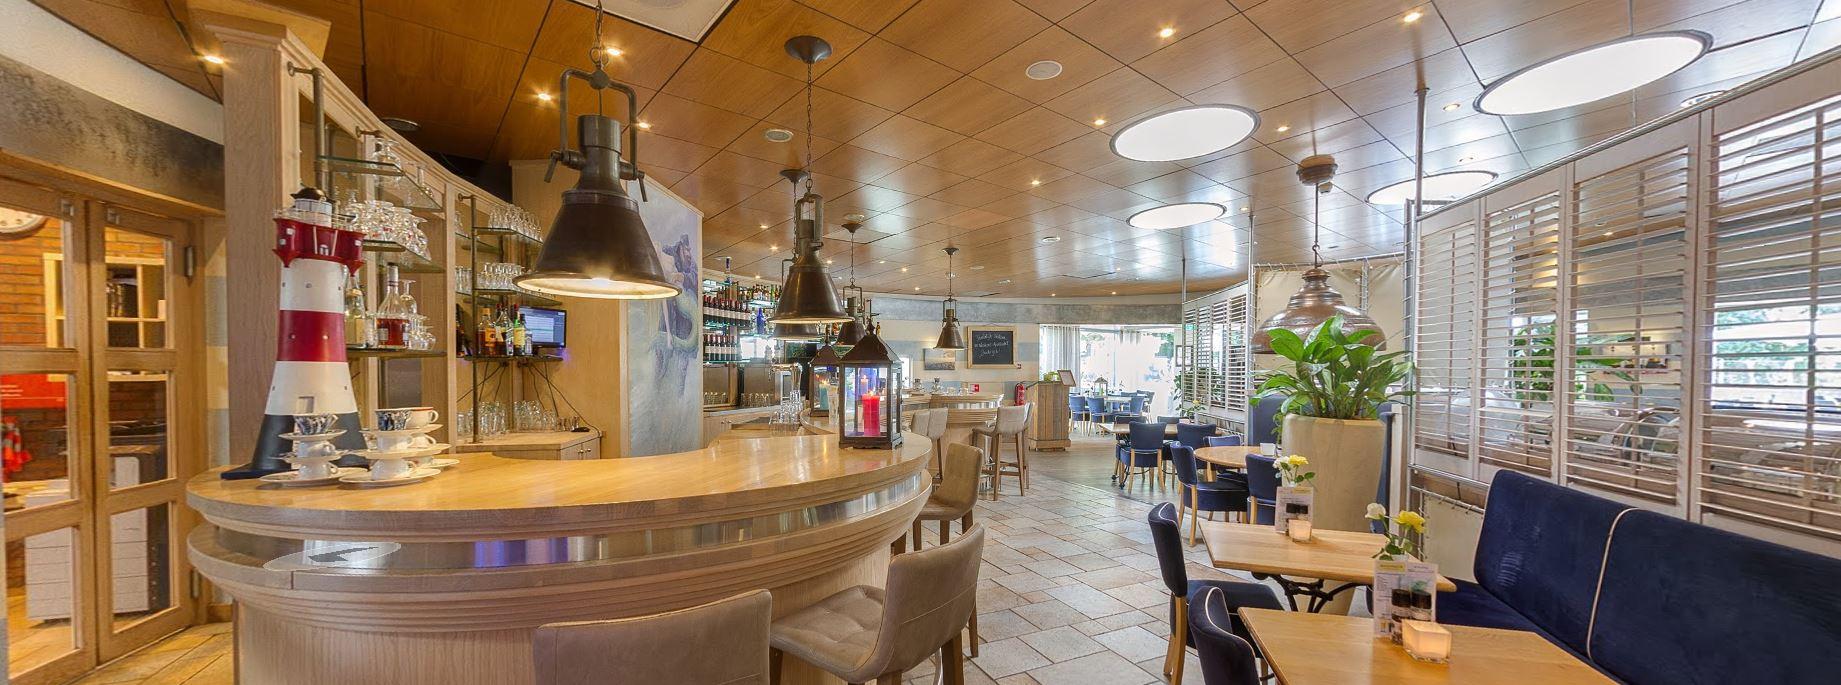 virtual-tour-restaurant-aparthotel-boschrijck